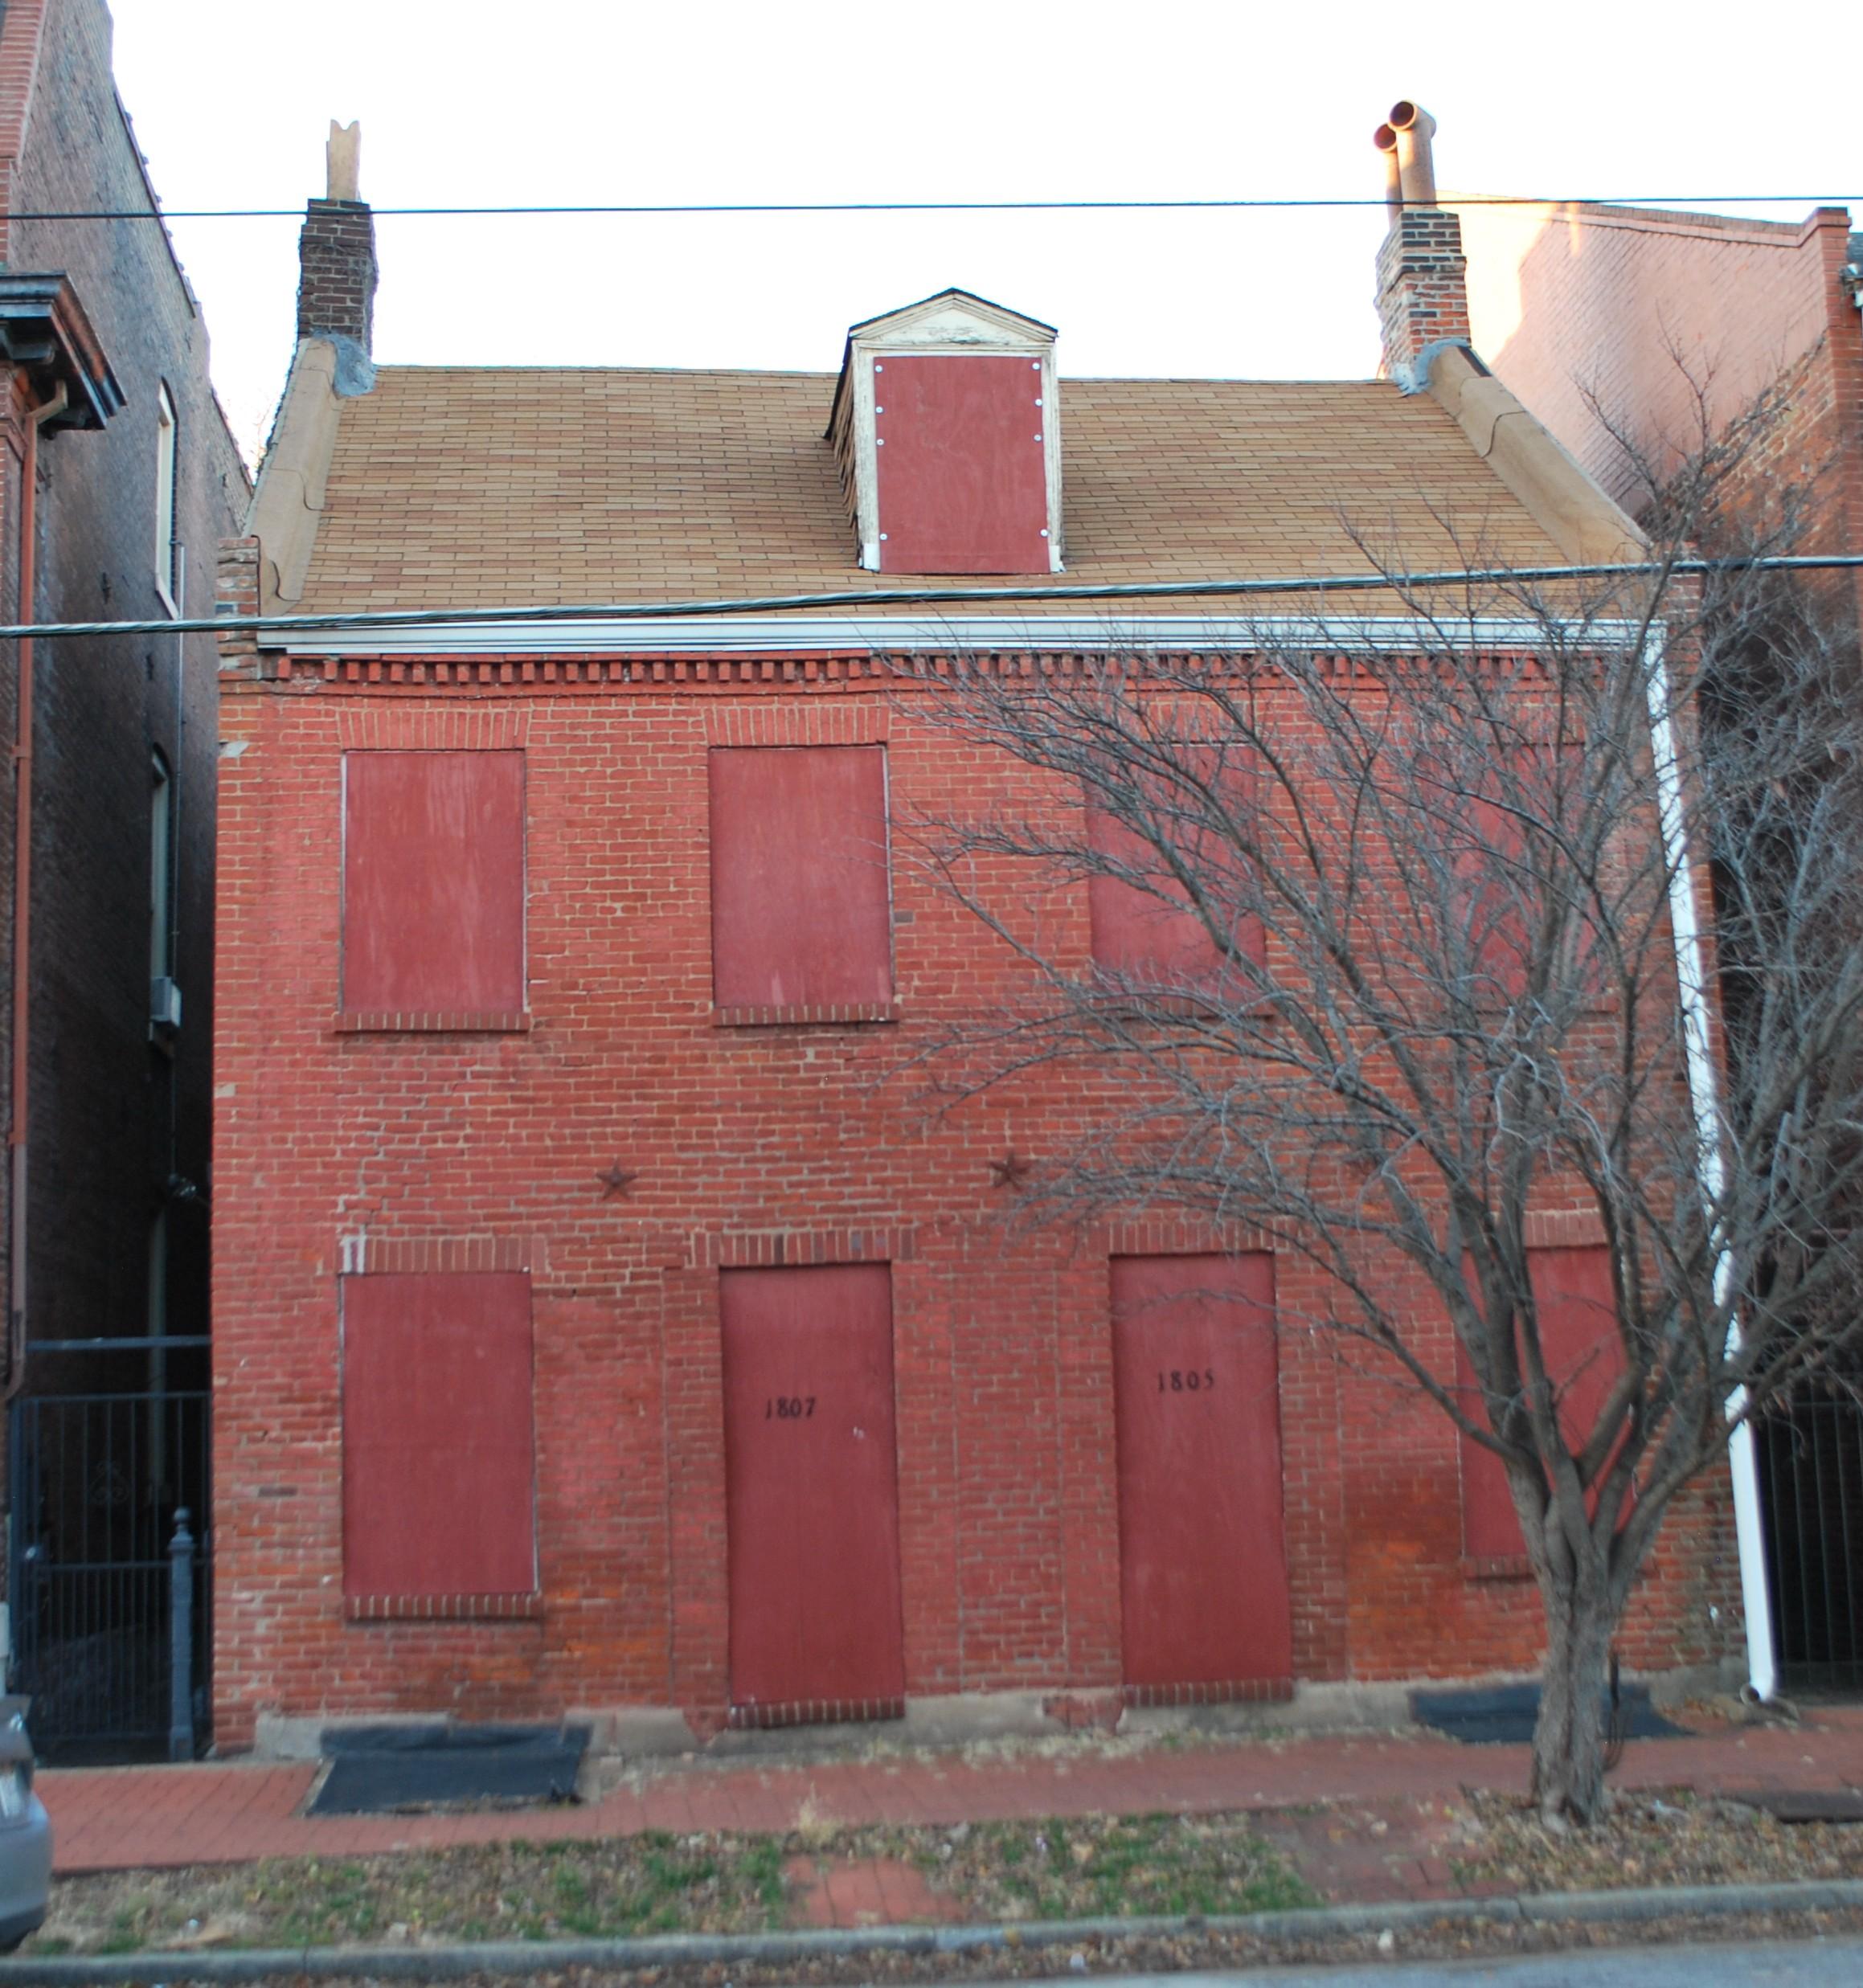 1805-1807 S 9th Street_2019 photo